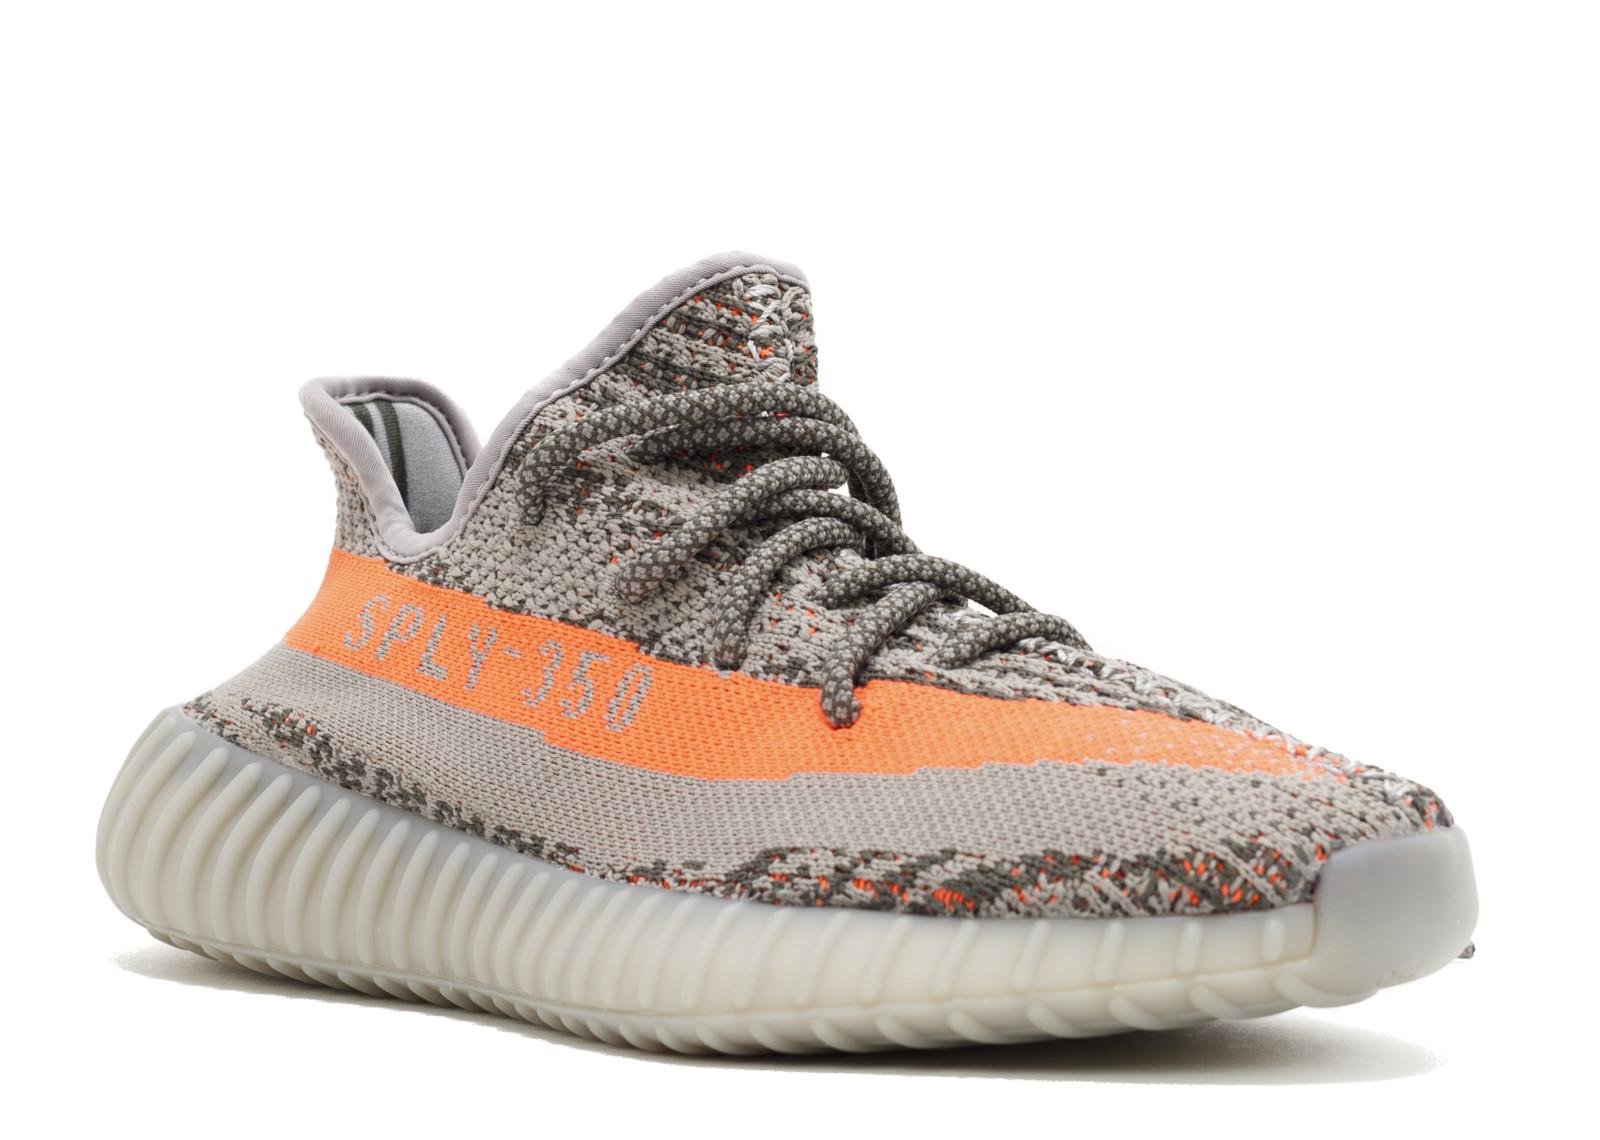 on sale b5774 c164e Kick Avenue - Authentic Sneakers